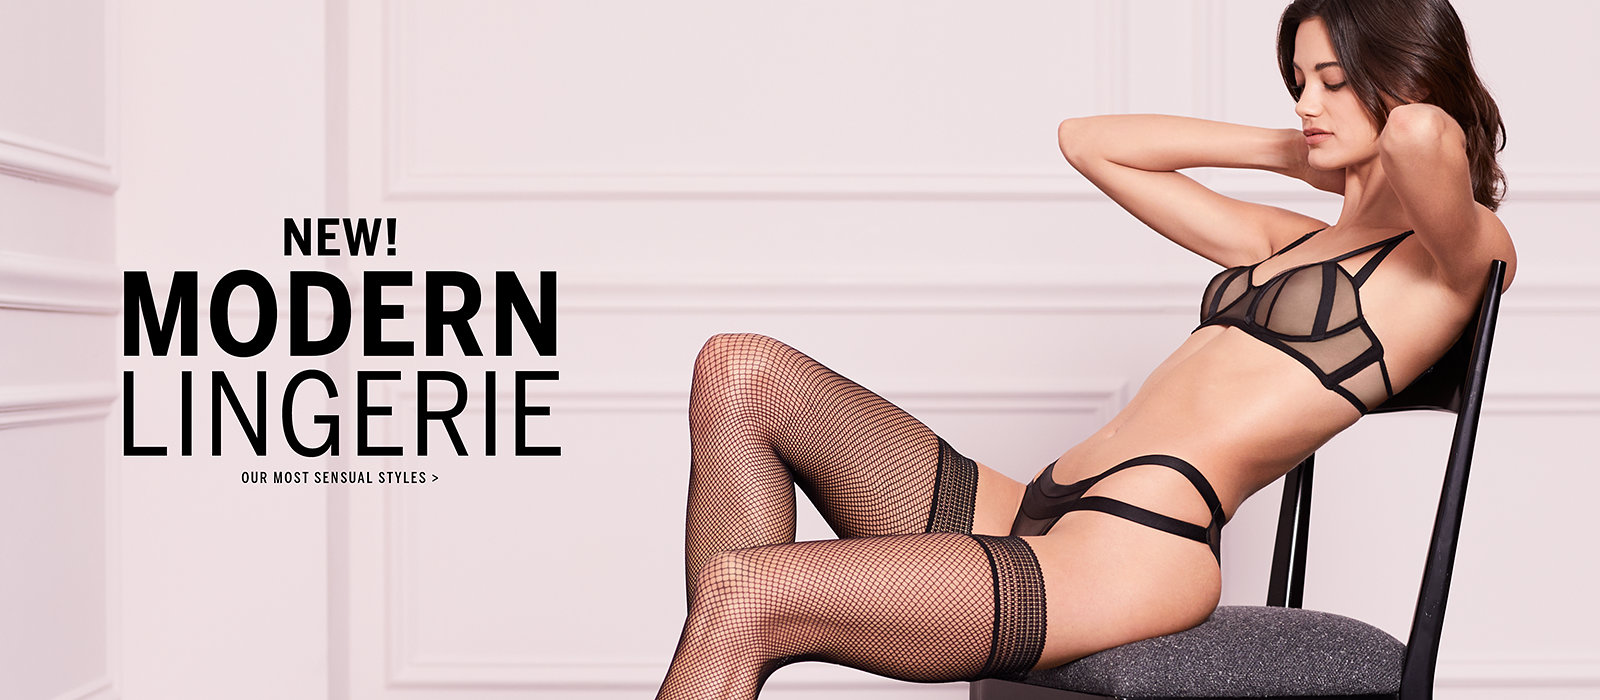 f43dff172 Bras  The World s Sexiest   Best-Fitting Bras - Victoria s Secret